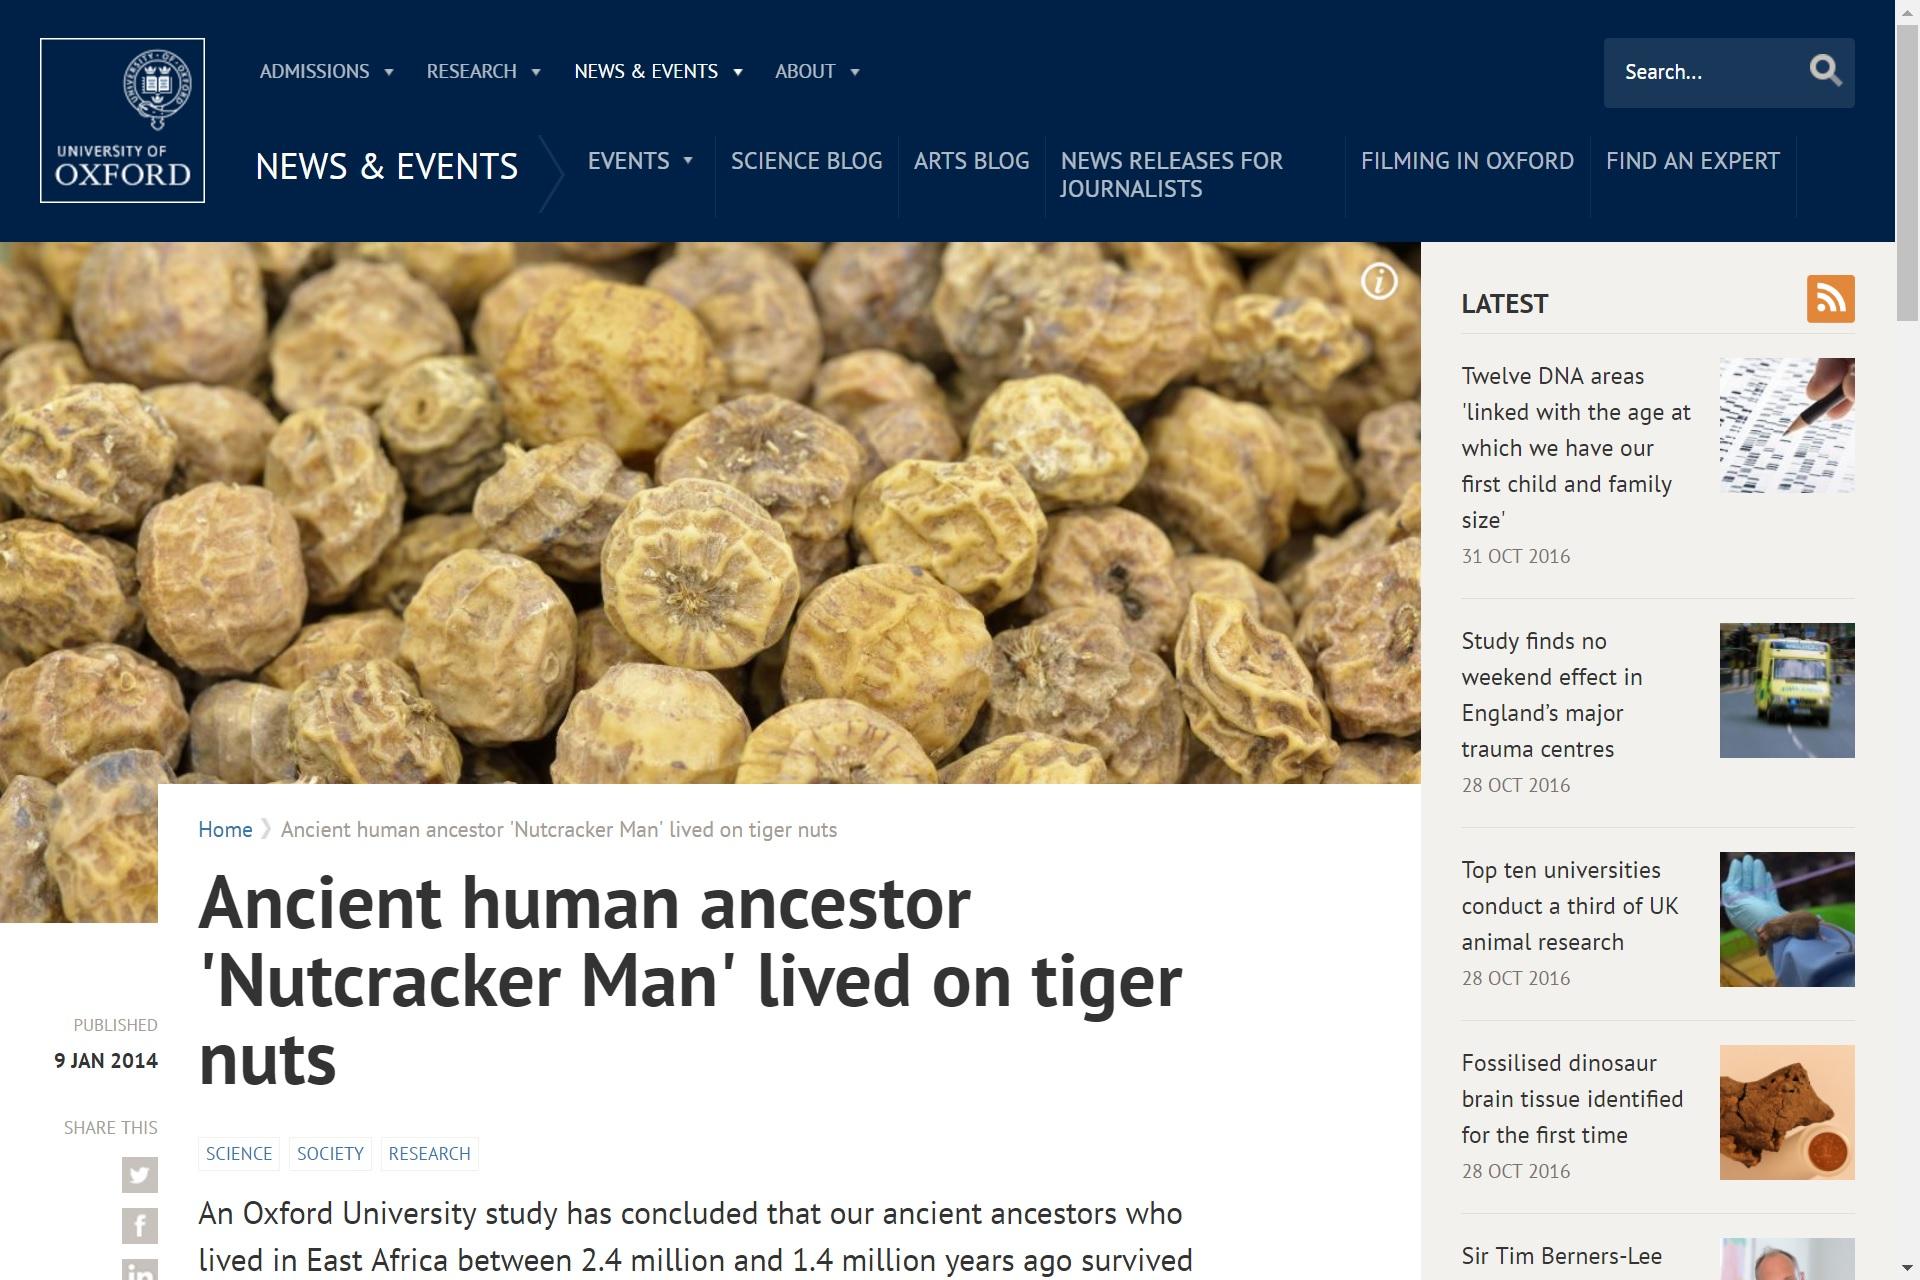 Ancient human ancestor 'Nutcracker Man lived on tiger nuts